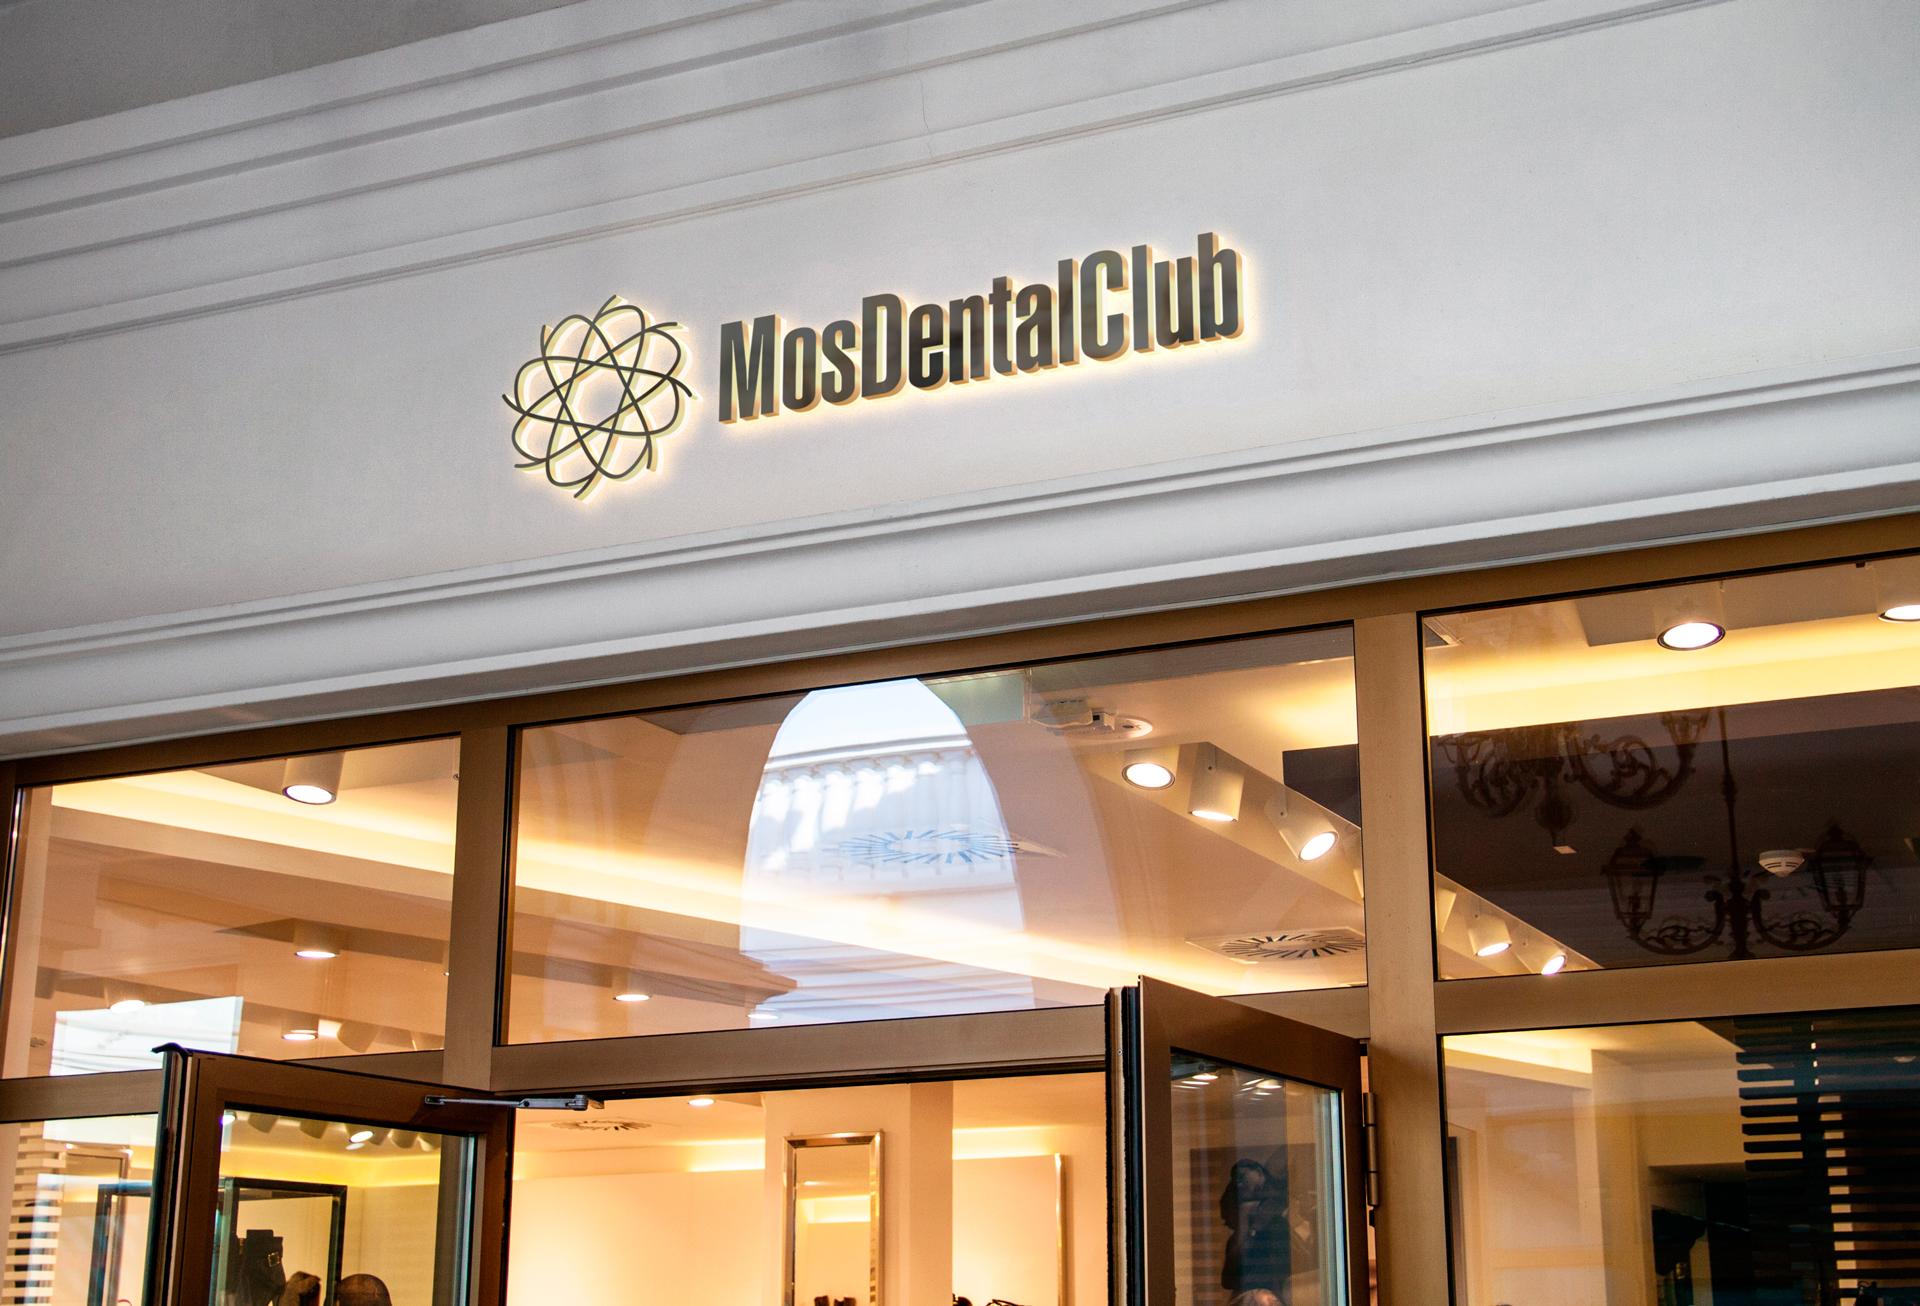 Разработка логотипа стоматологического медицинского центра фото f_5545e484acd0a51a.jpg